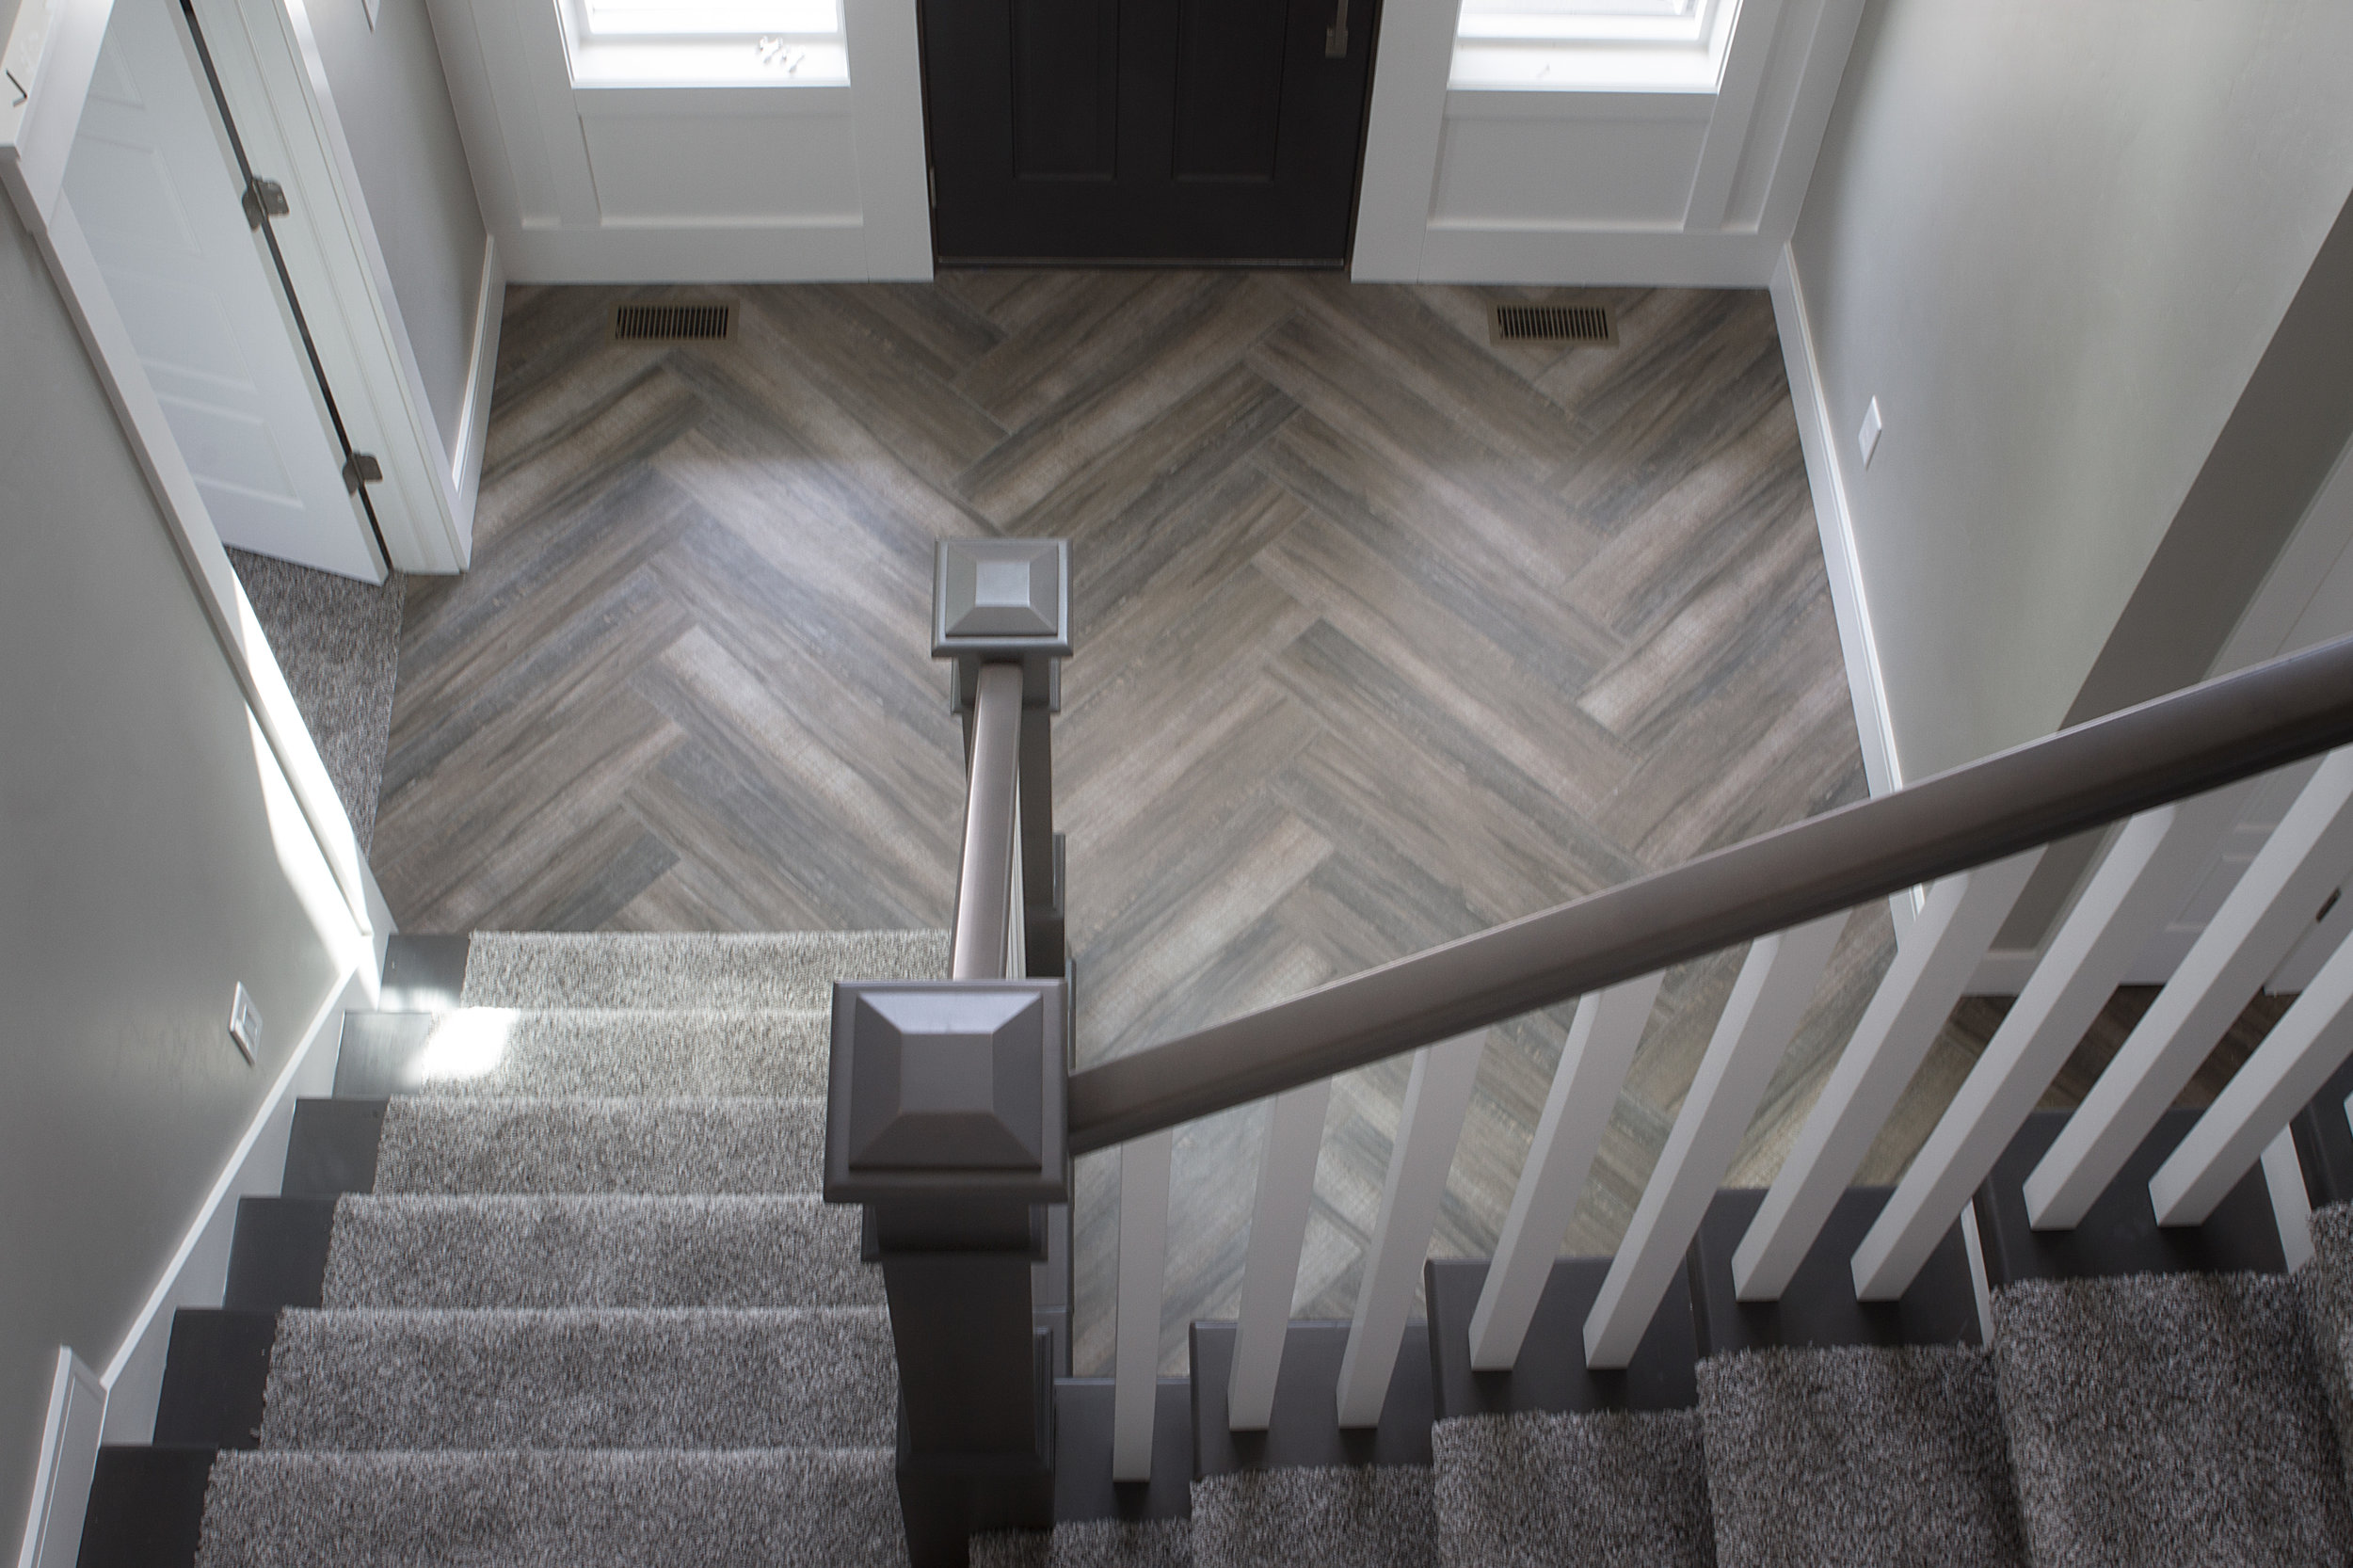 herringbone wood texture tile floor